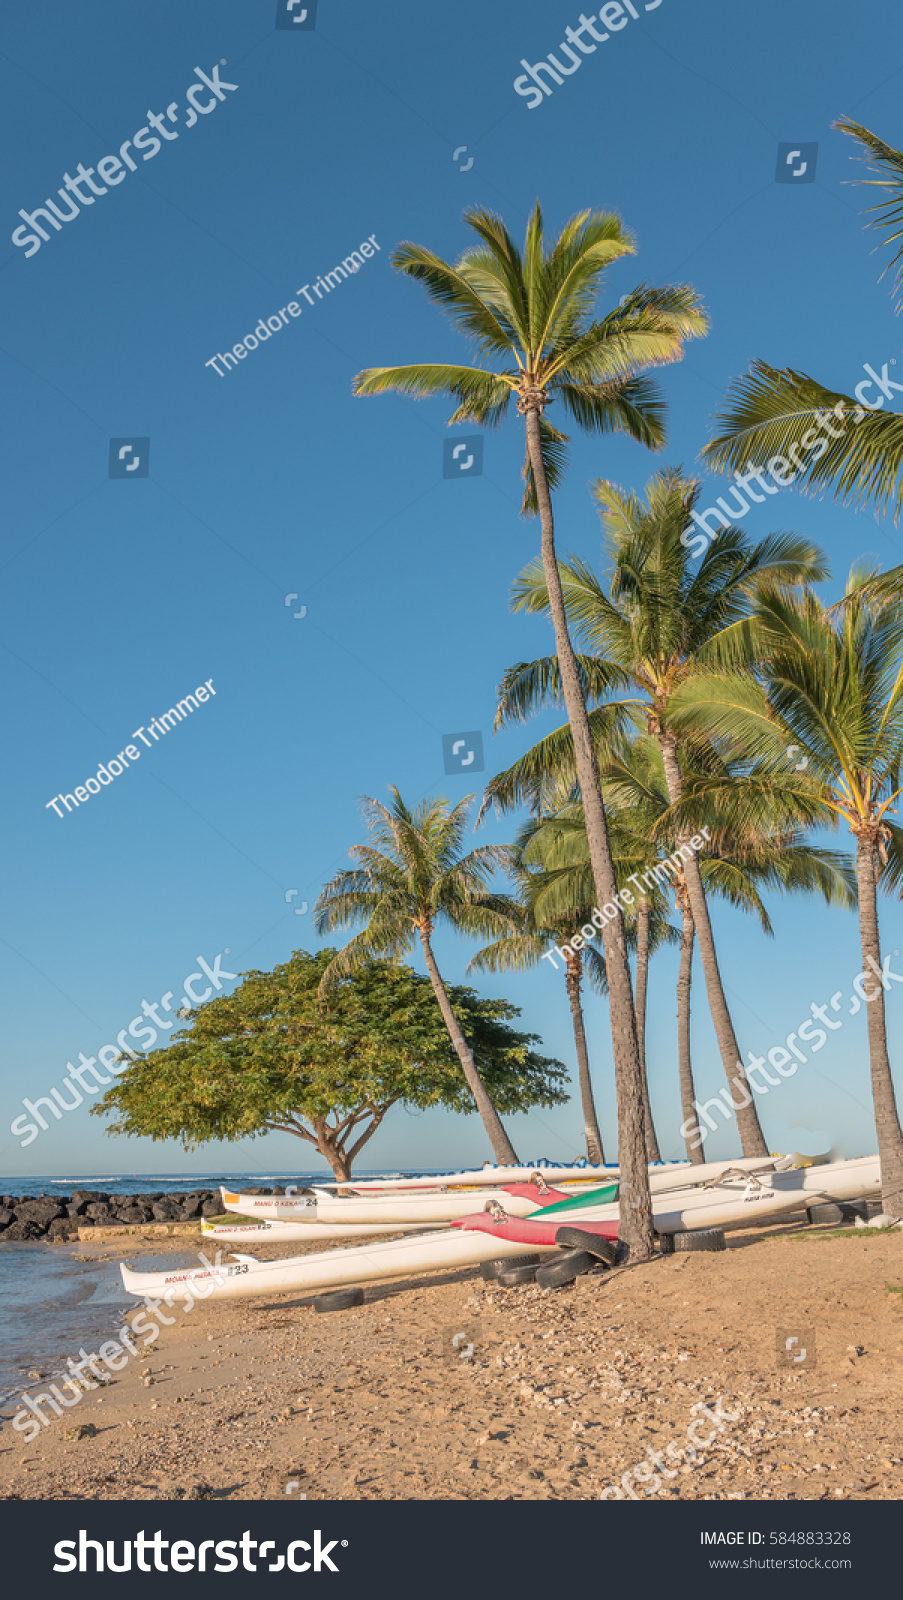 stock image of hawaiian - photo #19